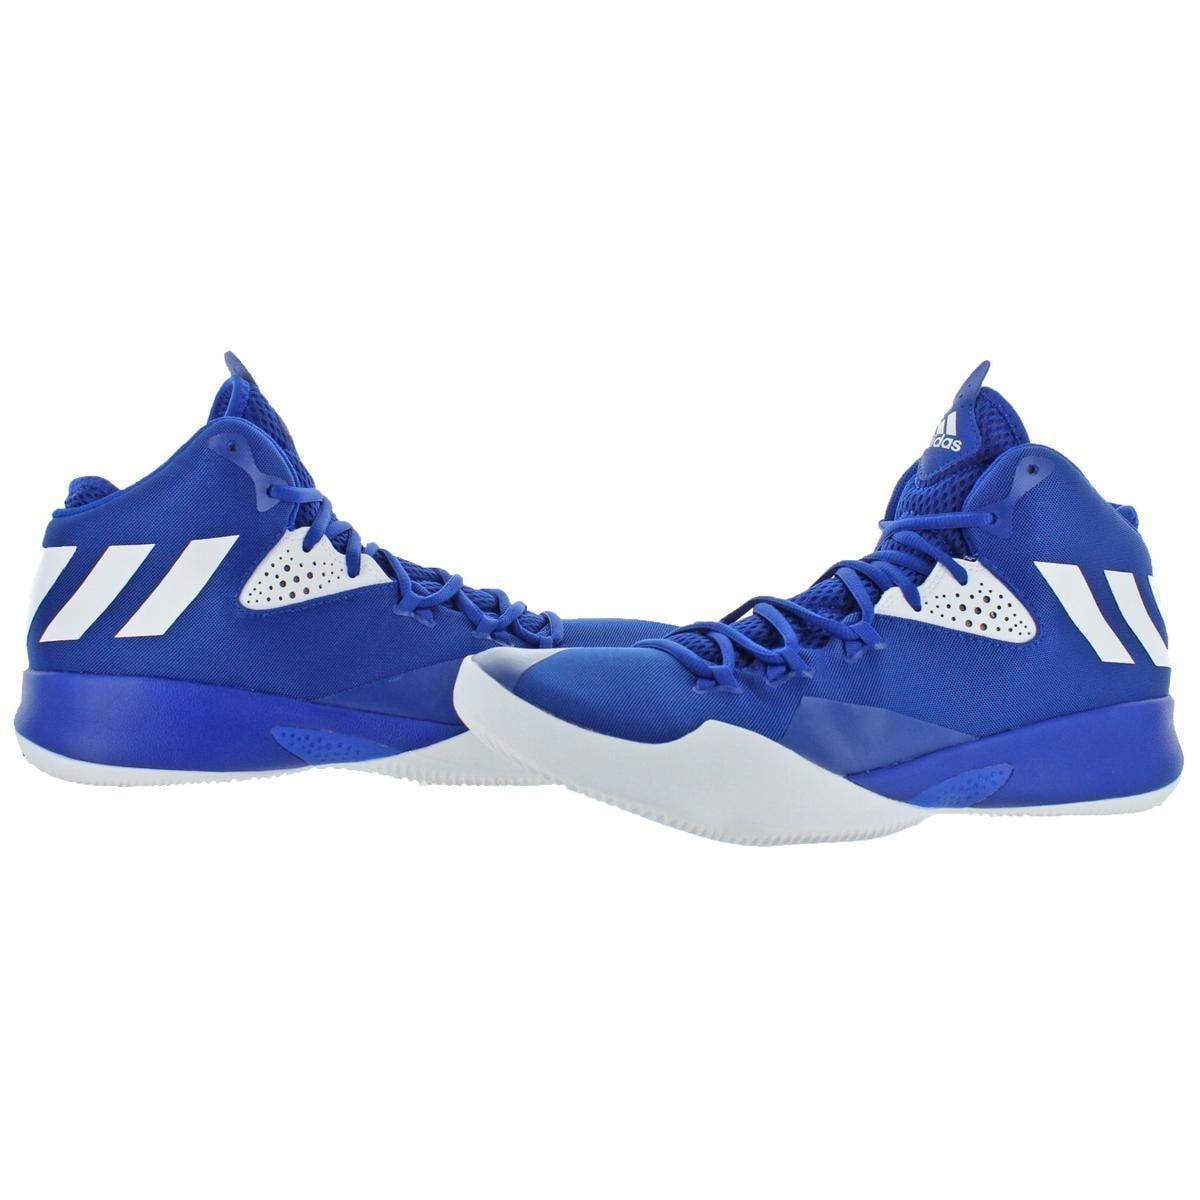 867b506dfac2a Adidas Mens Dual Threat 2017 Basketball Shoes Trainer Performance - 10.5  medium (d)